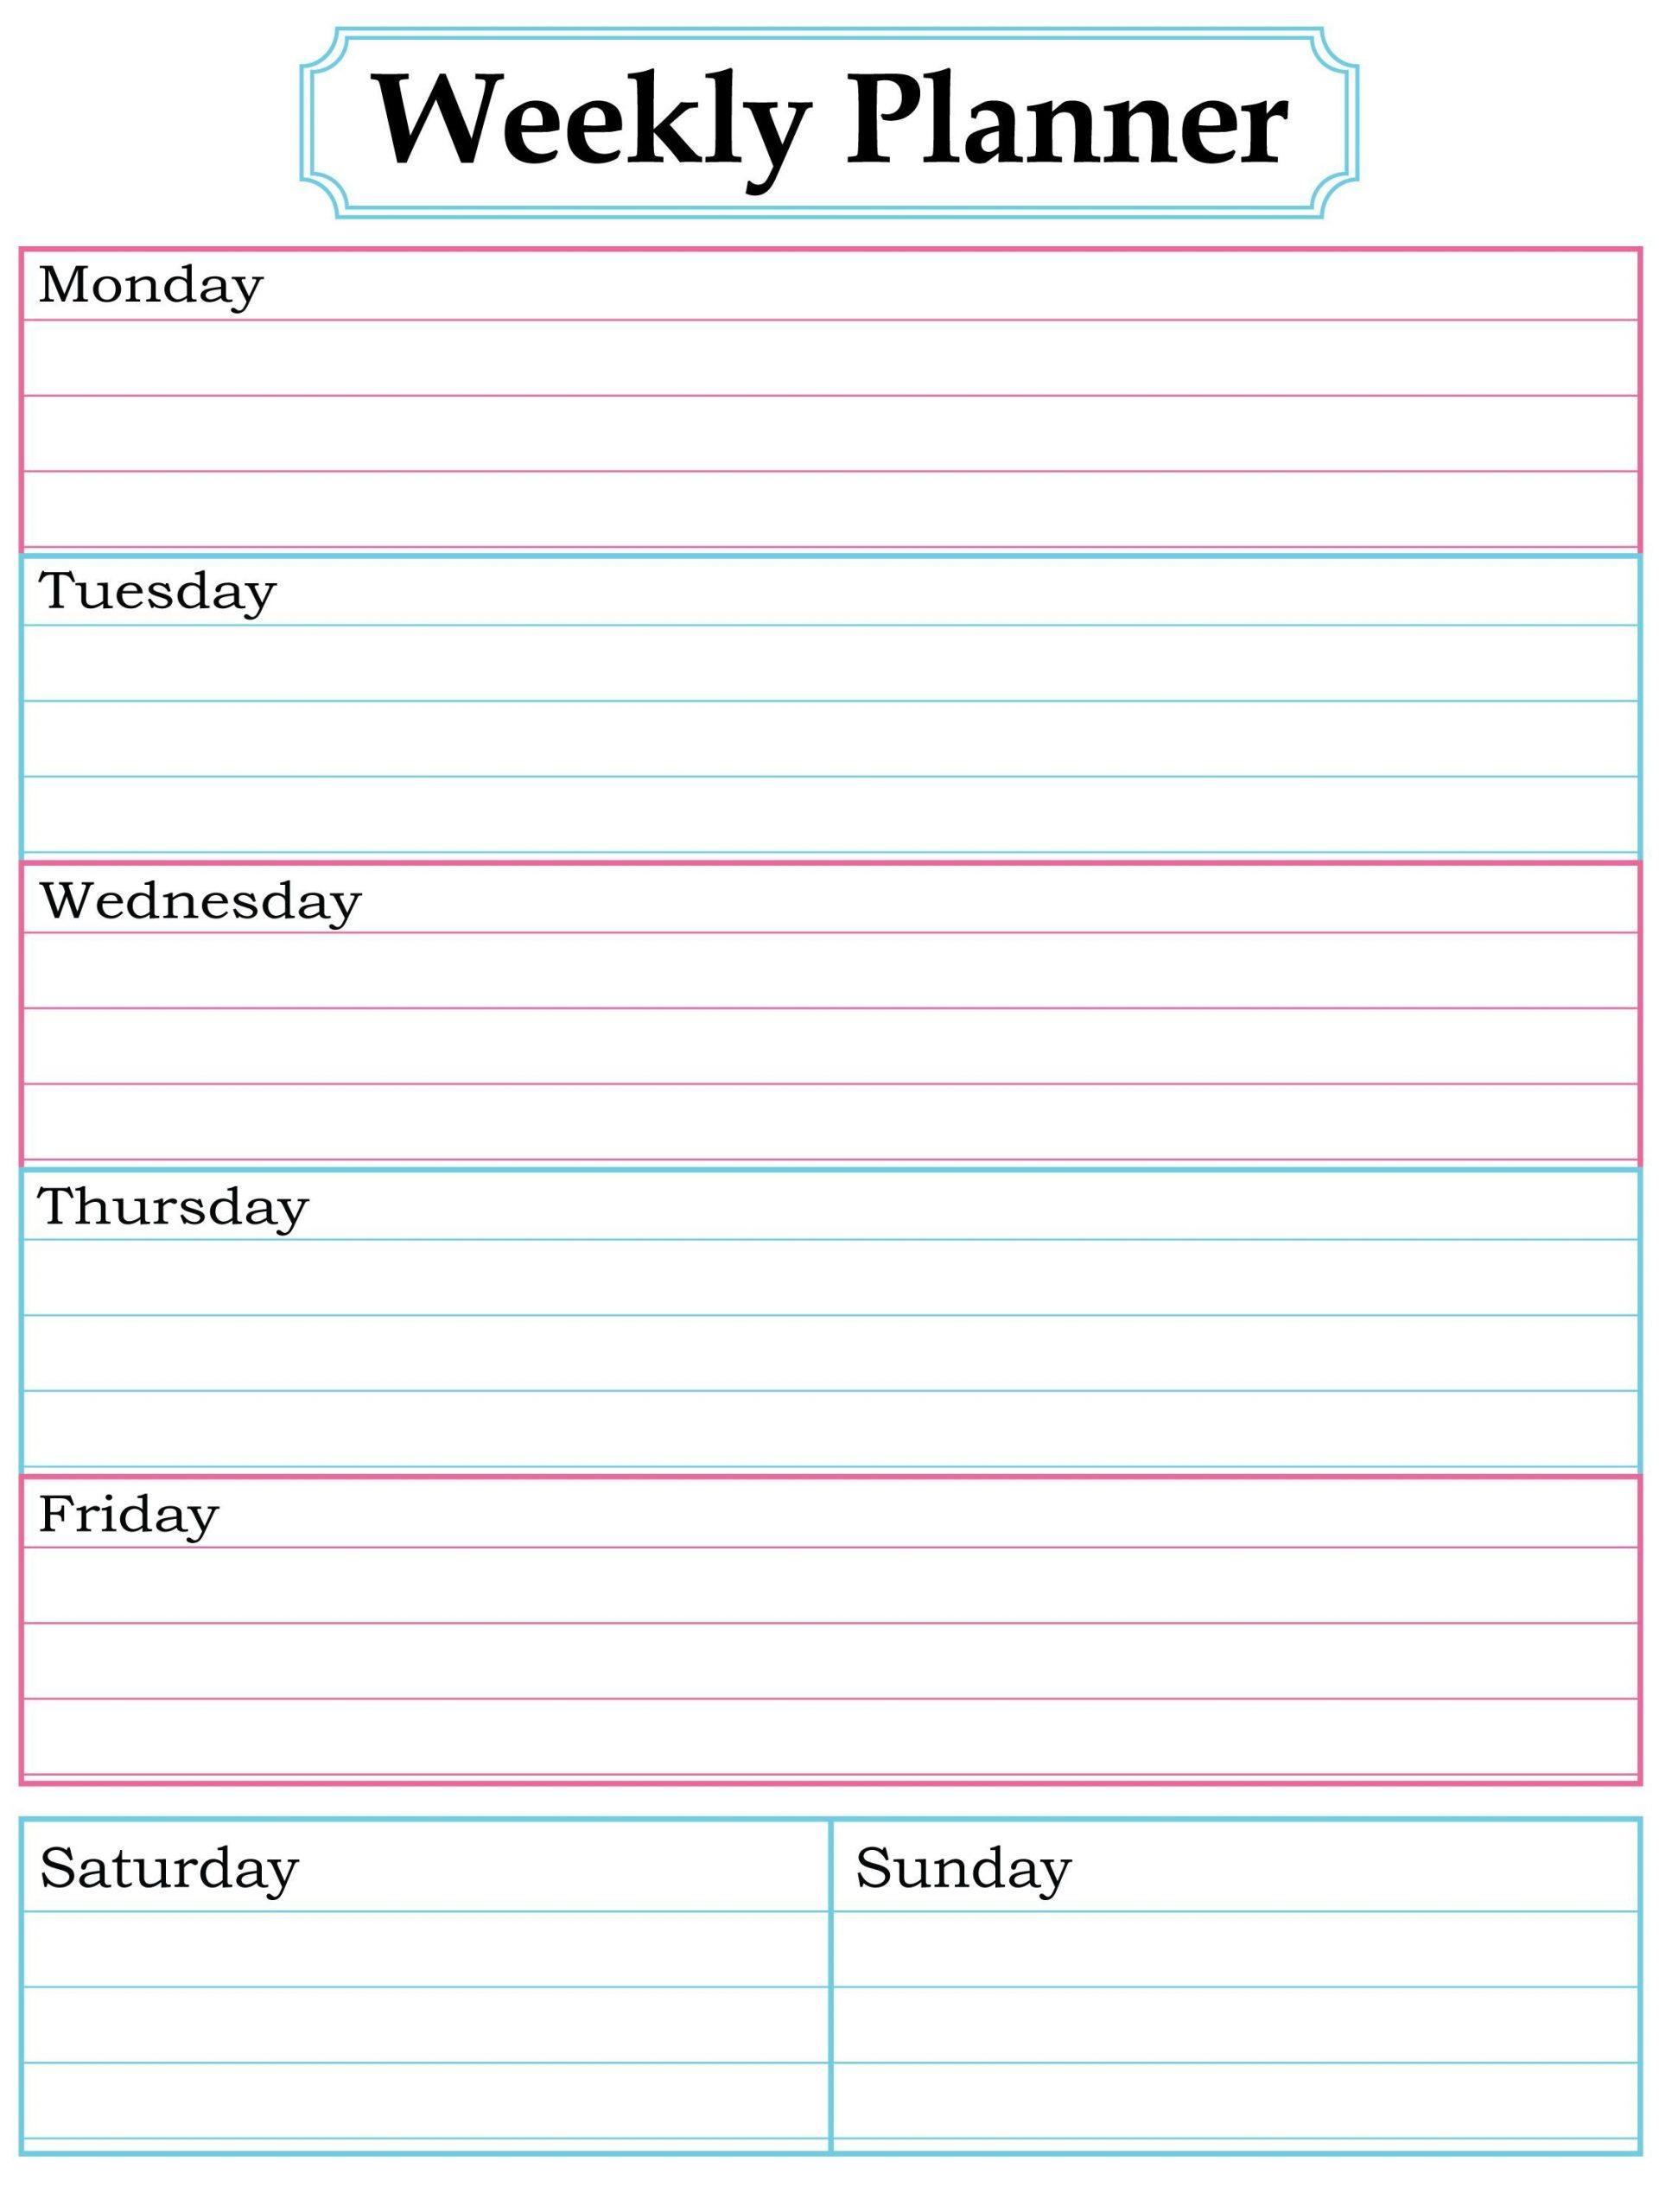 Blank Weekly Calendar To Fill In   Calendar Template Fill In School Schedule